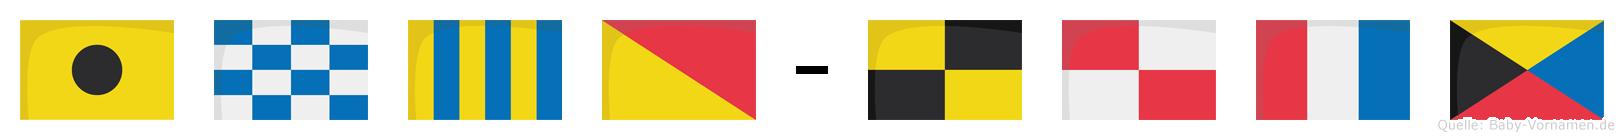 Ingo-Lutz im Flaggenalphabet